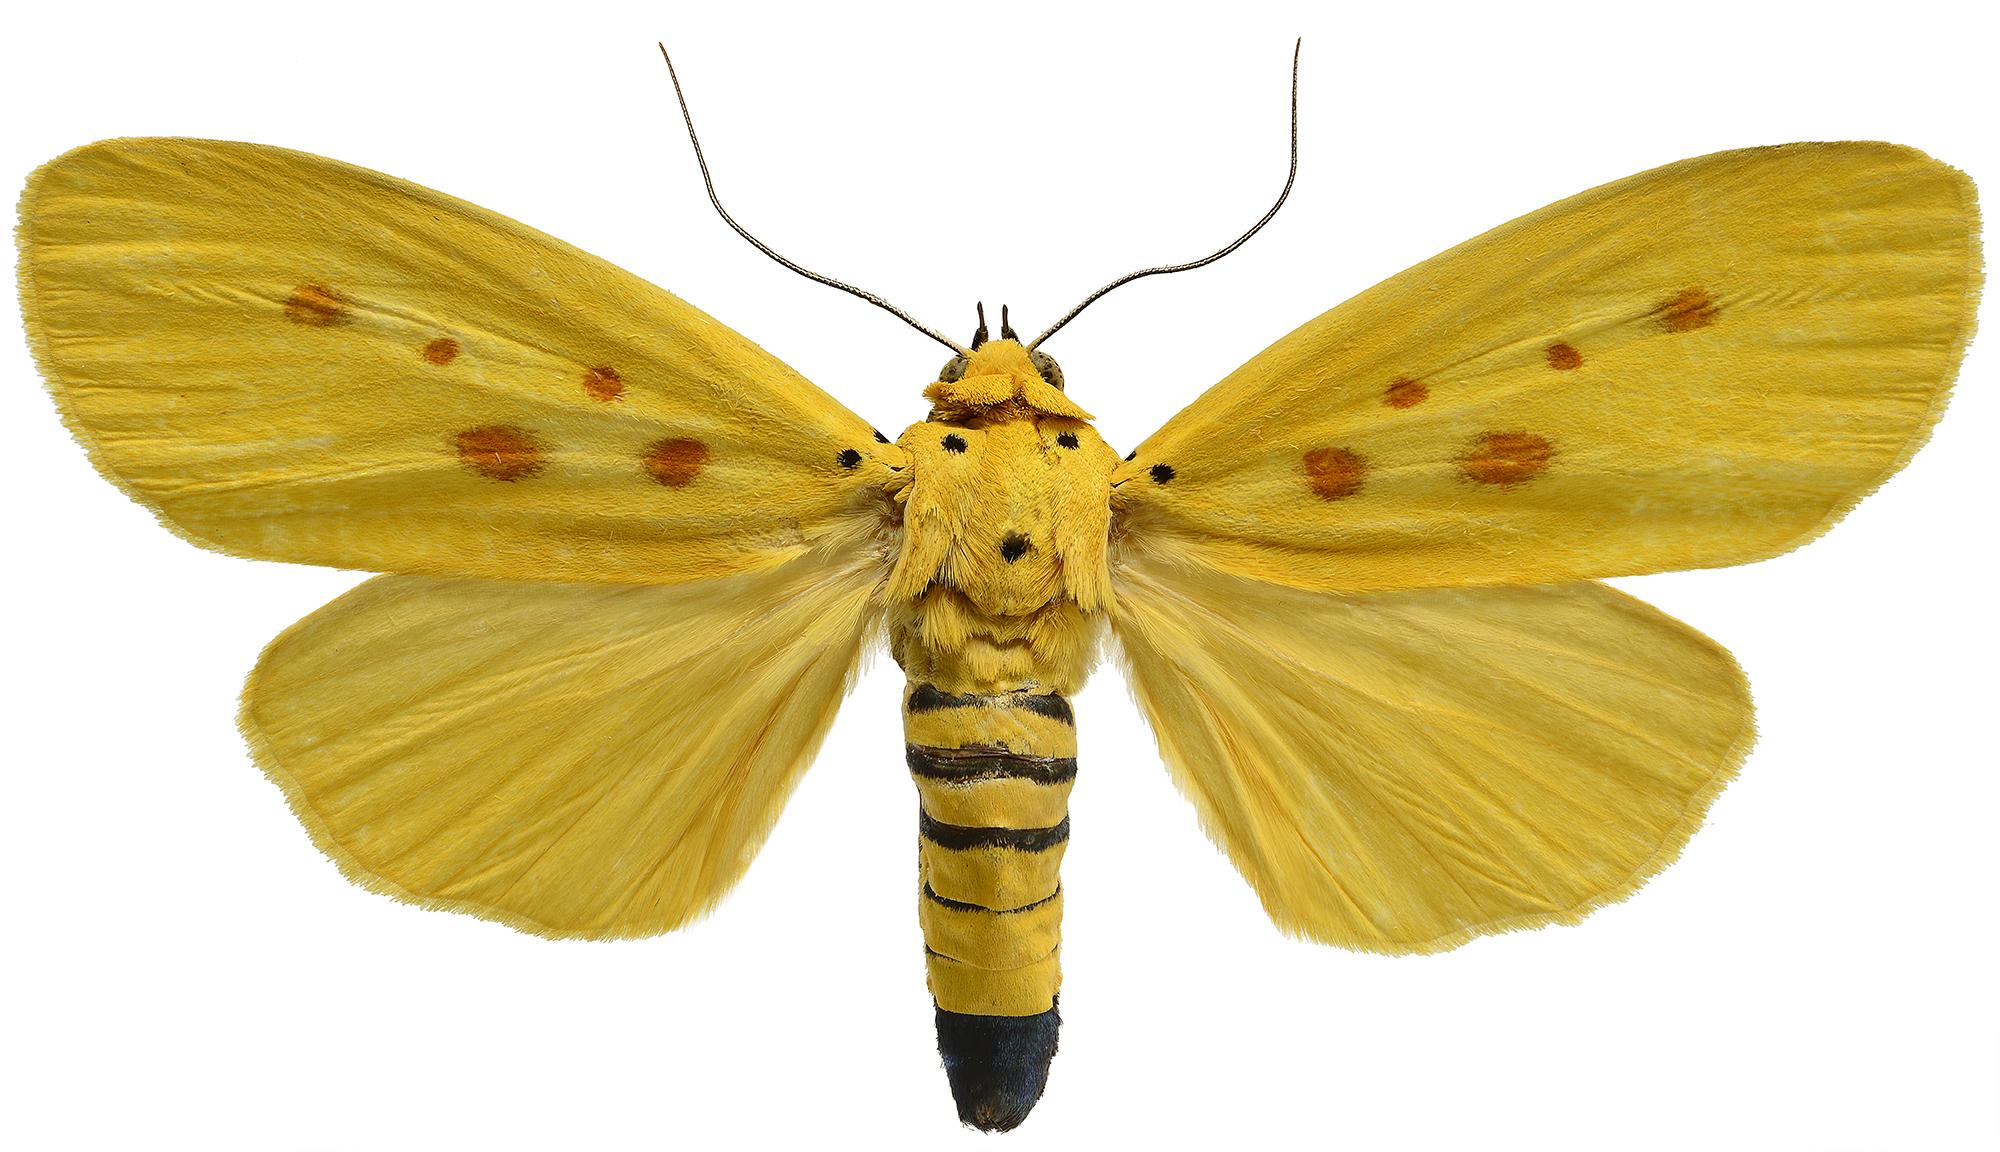 Agape chlorophylla 2000